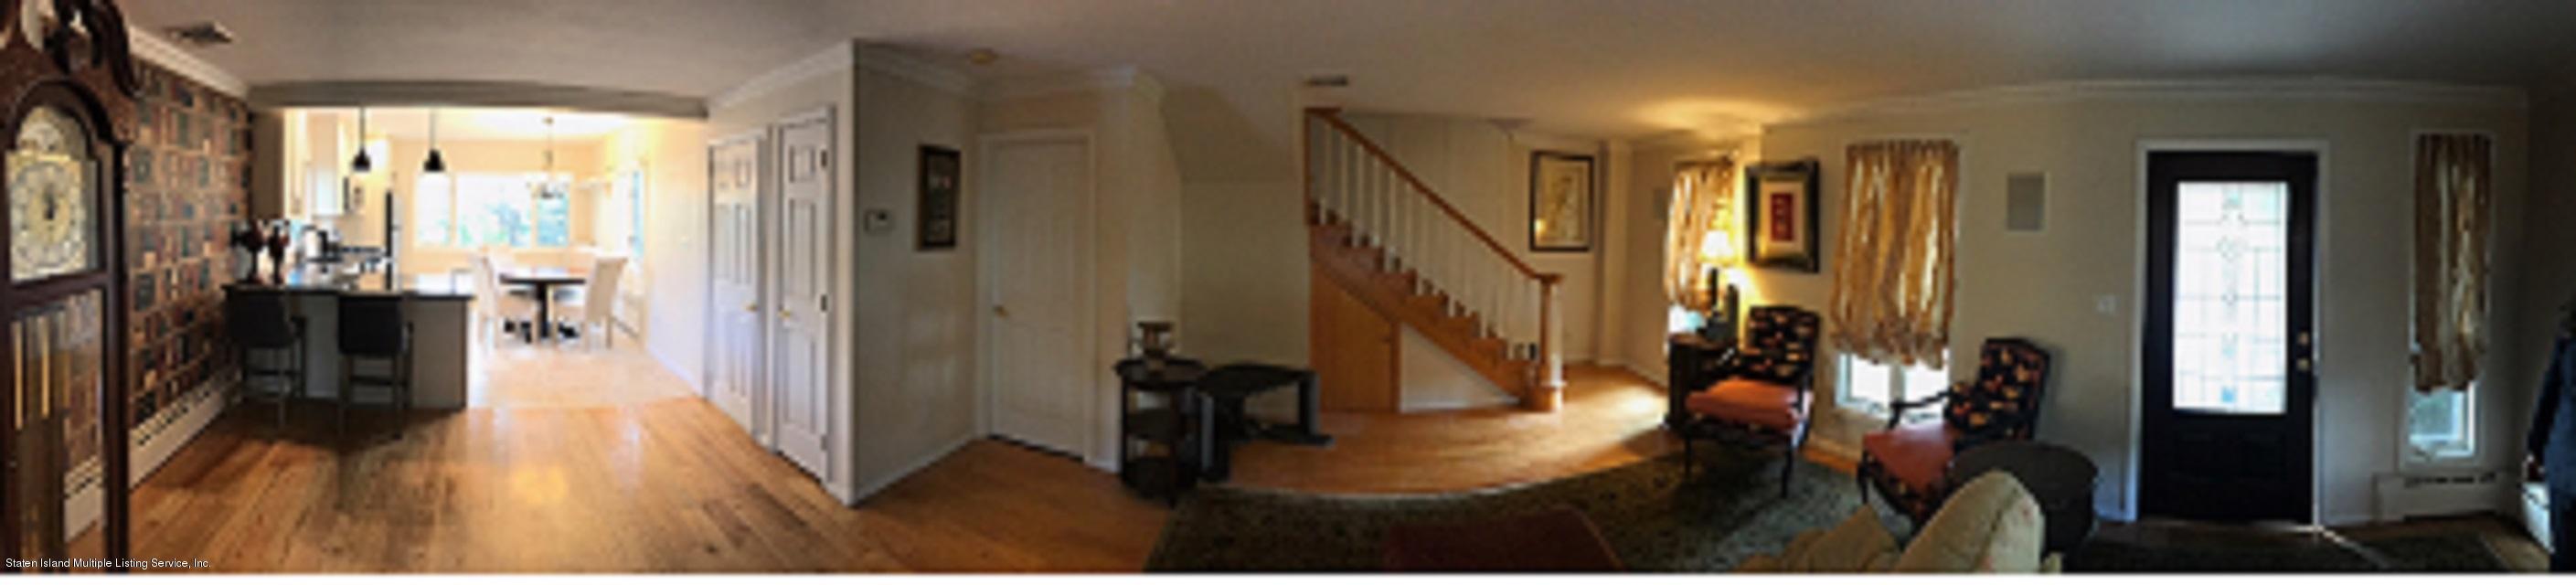 Single Family - Detached 69 Locust Avenue  Staten Island, NY 10306, MLS-1112578-10